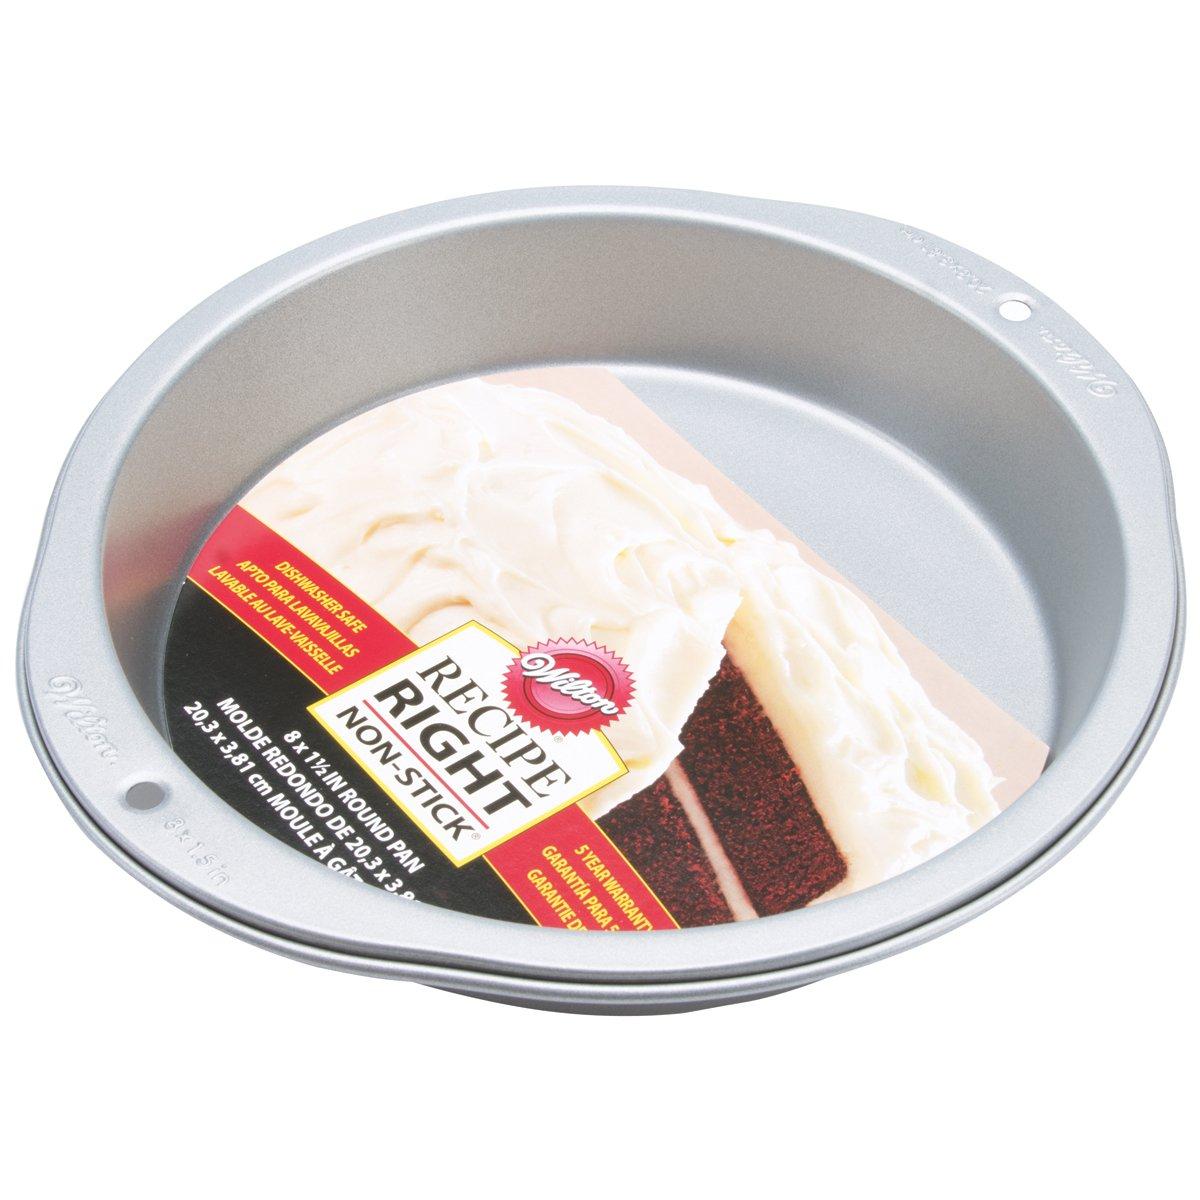 Wilton Recipe Right 8-Inch Round Pan 2105-957